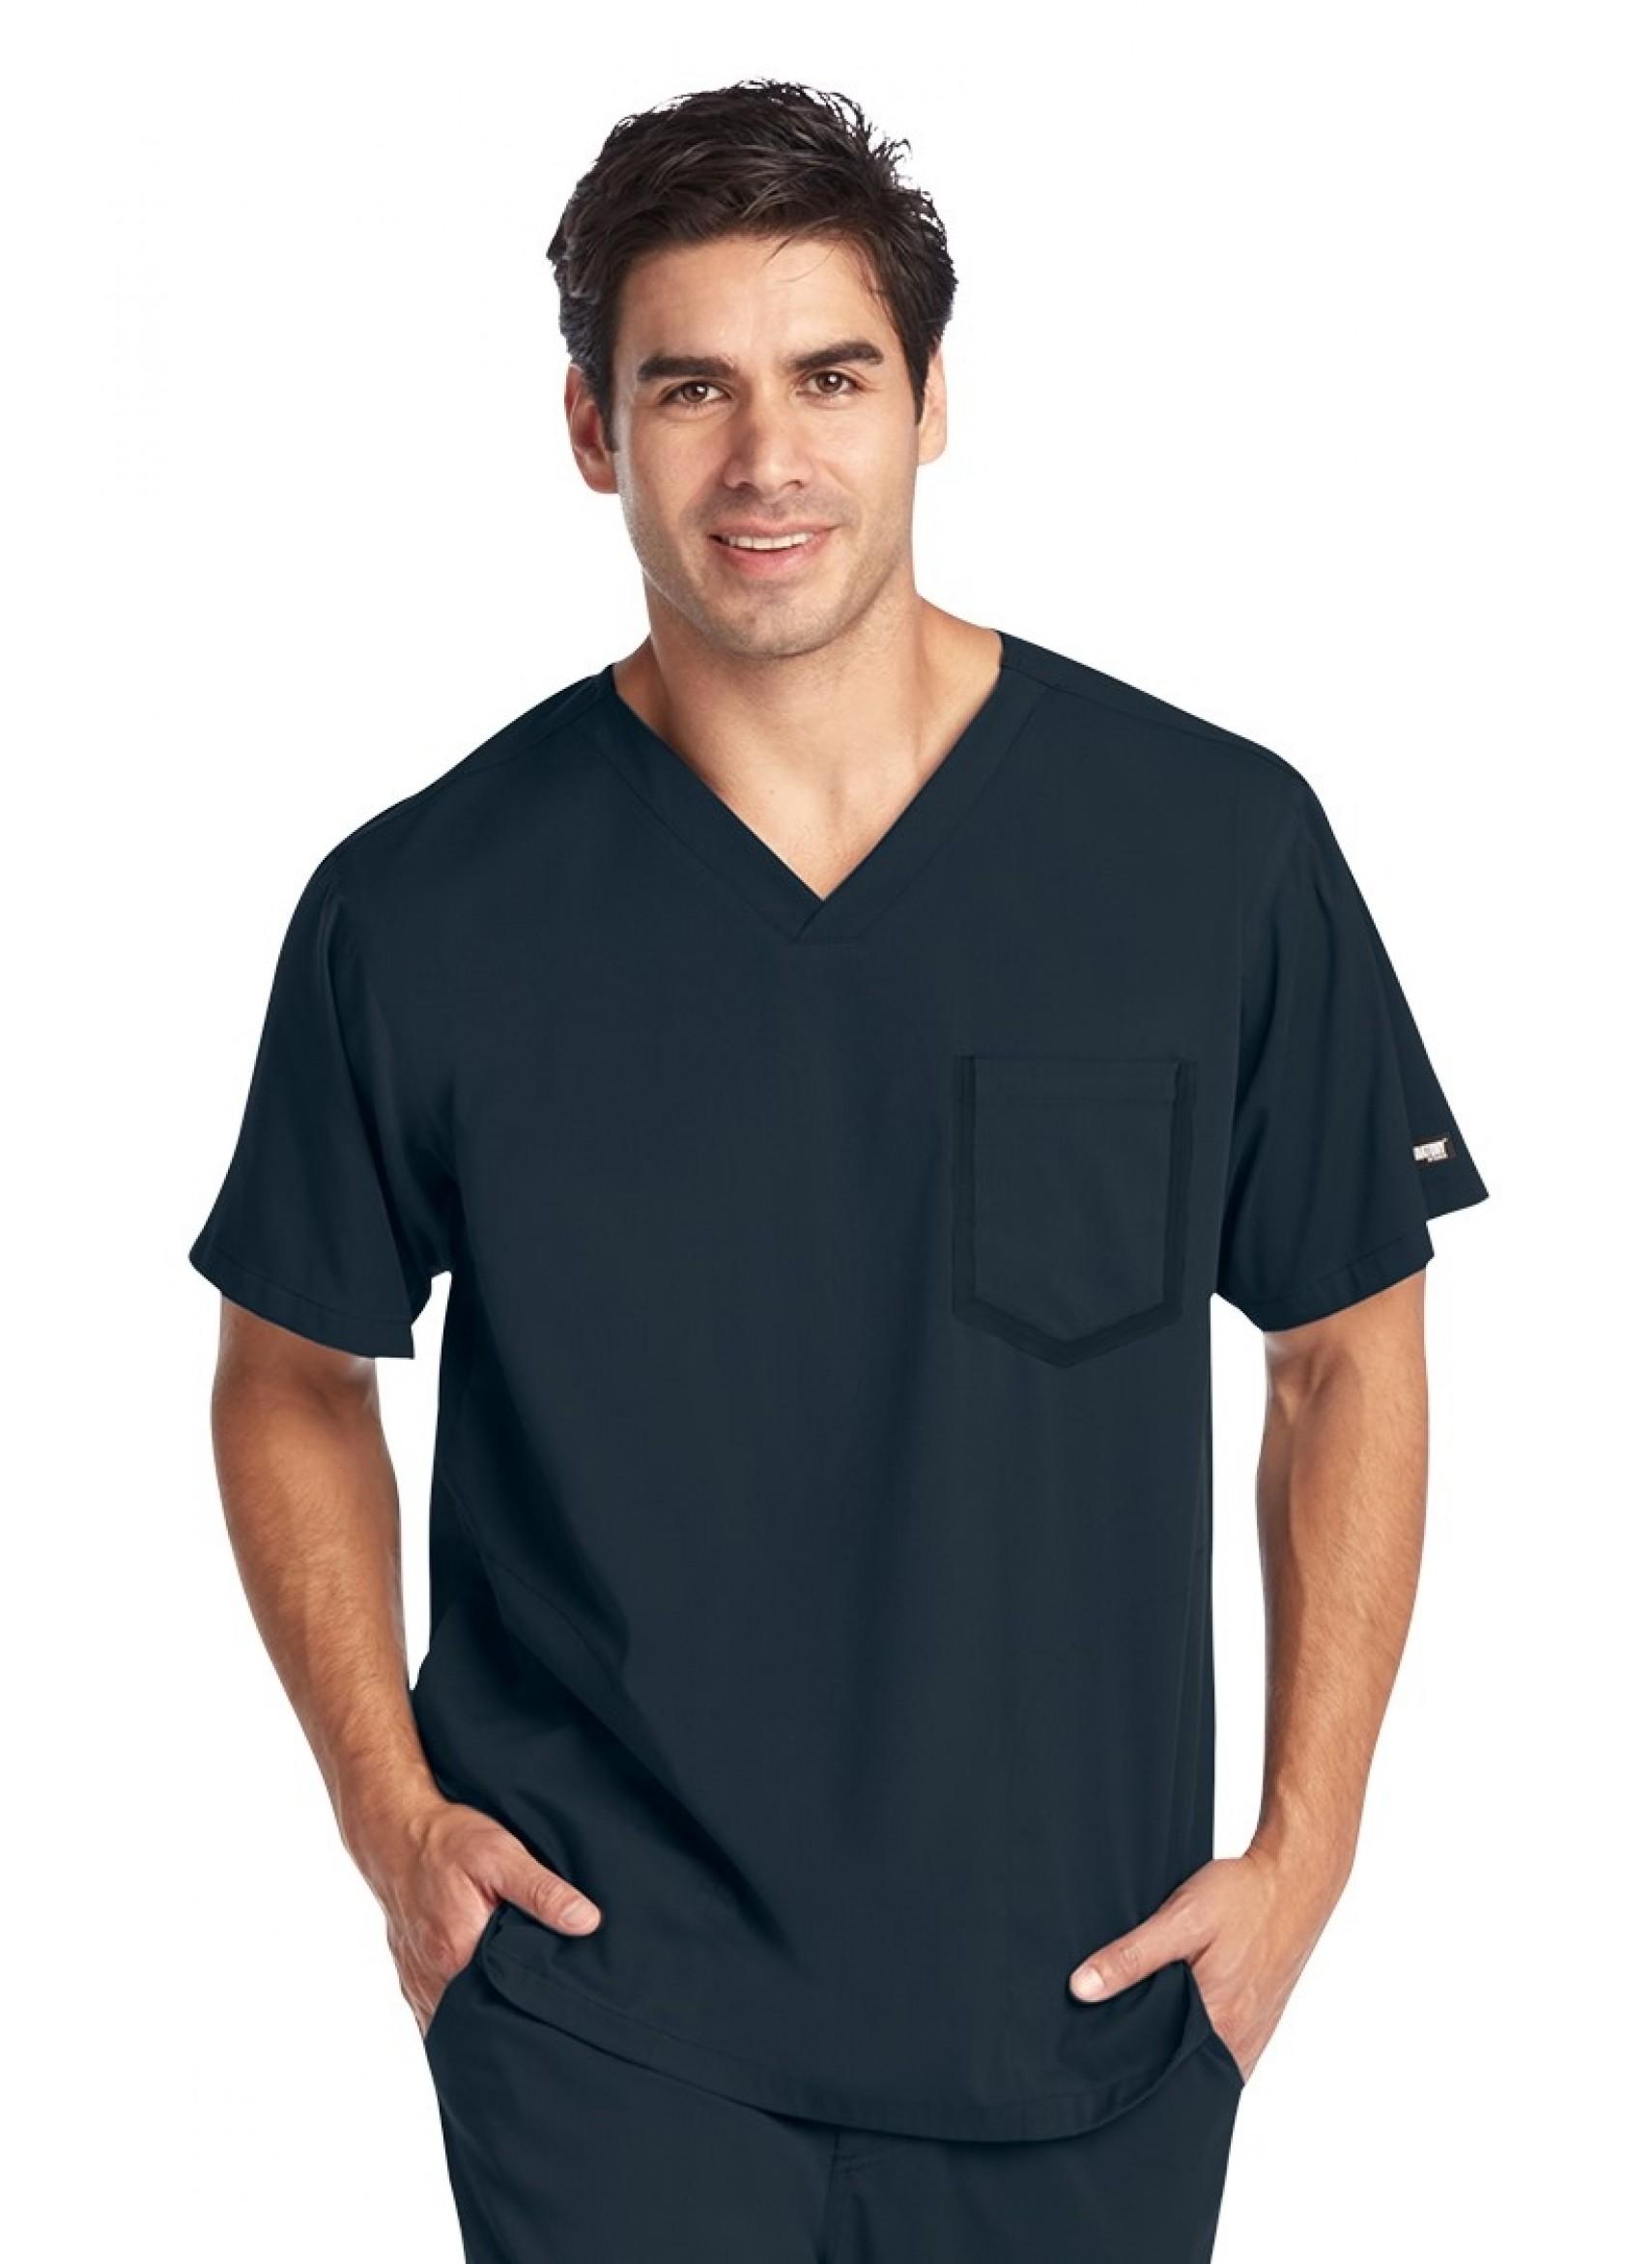 6196f0b8d2 Grey's Anatomy Impact Men's V-Neck Scrub Top - 0118 | Murse World